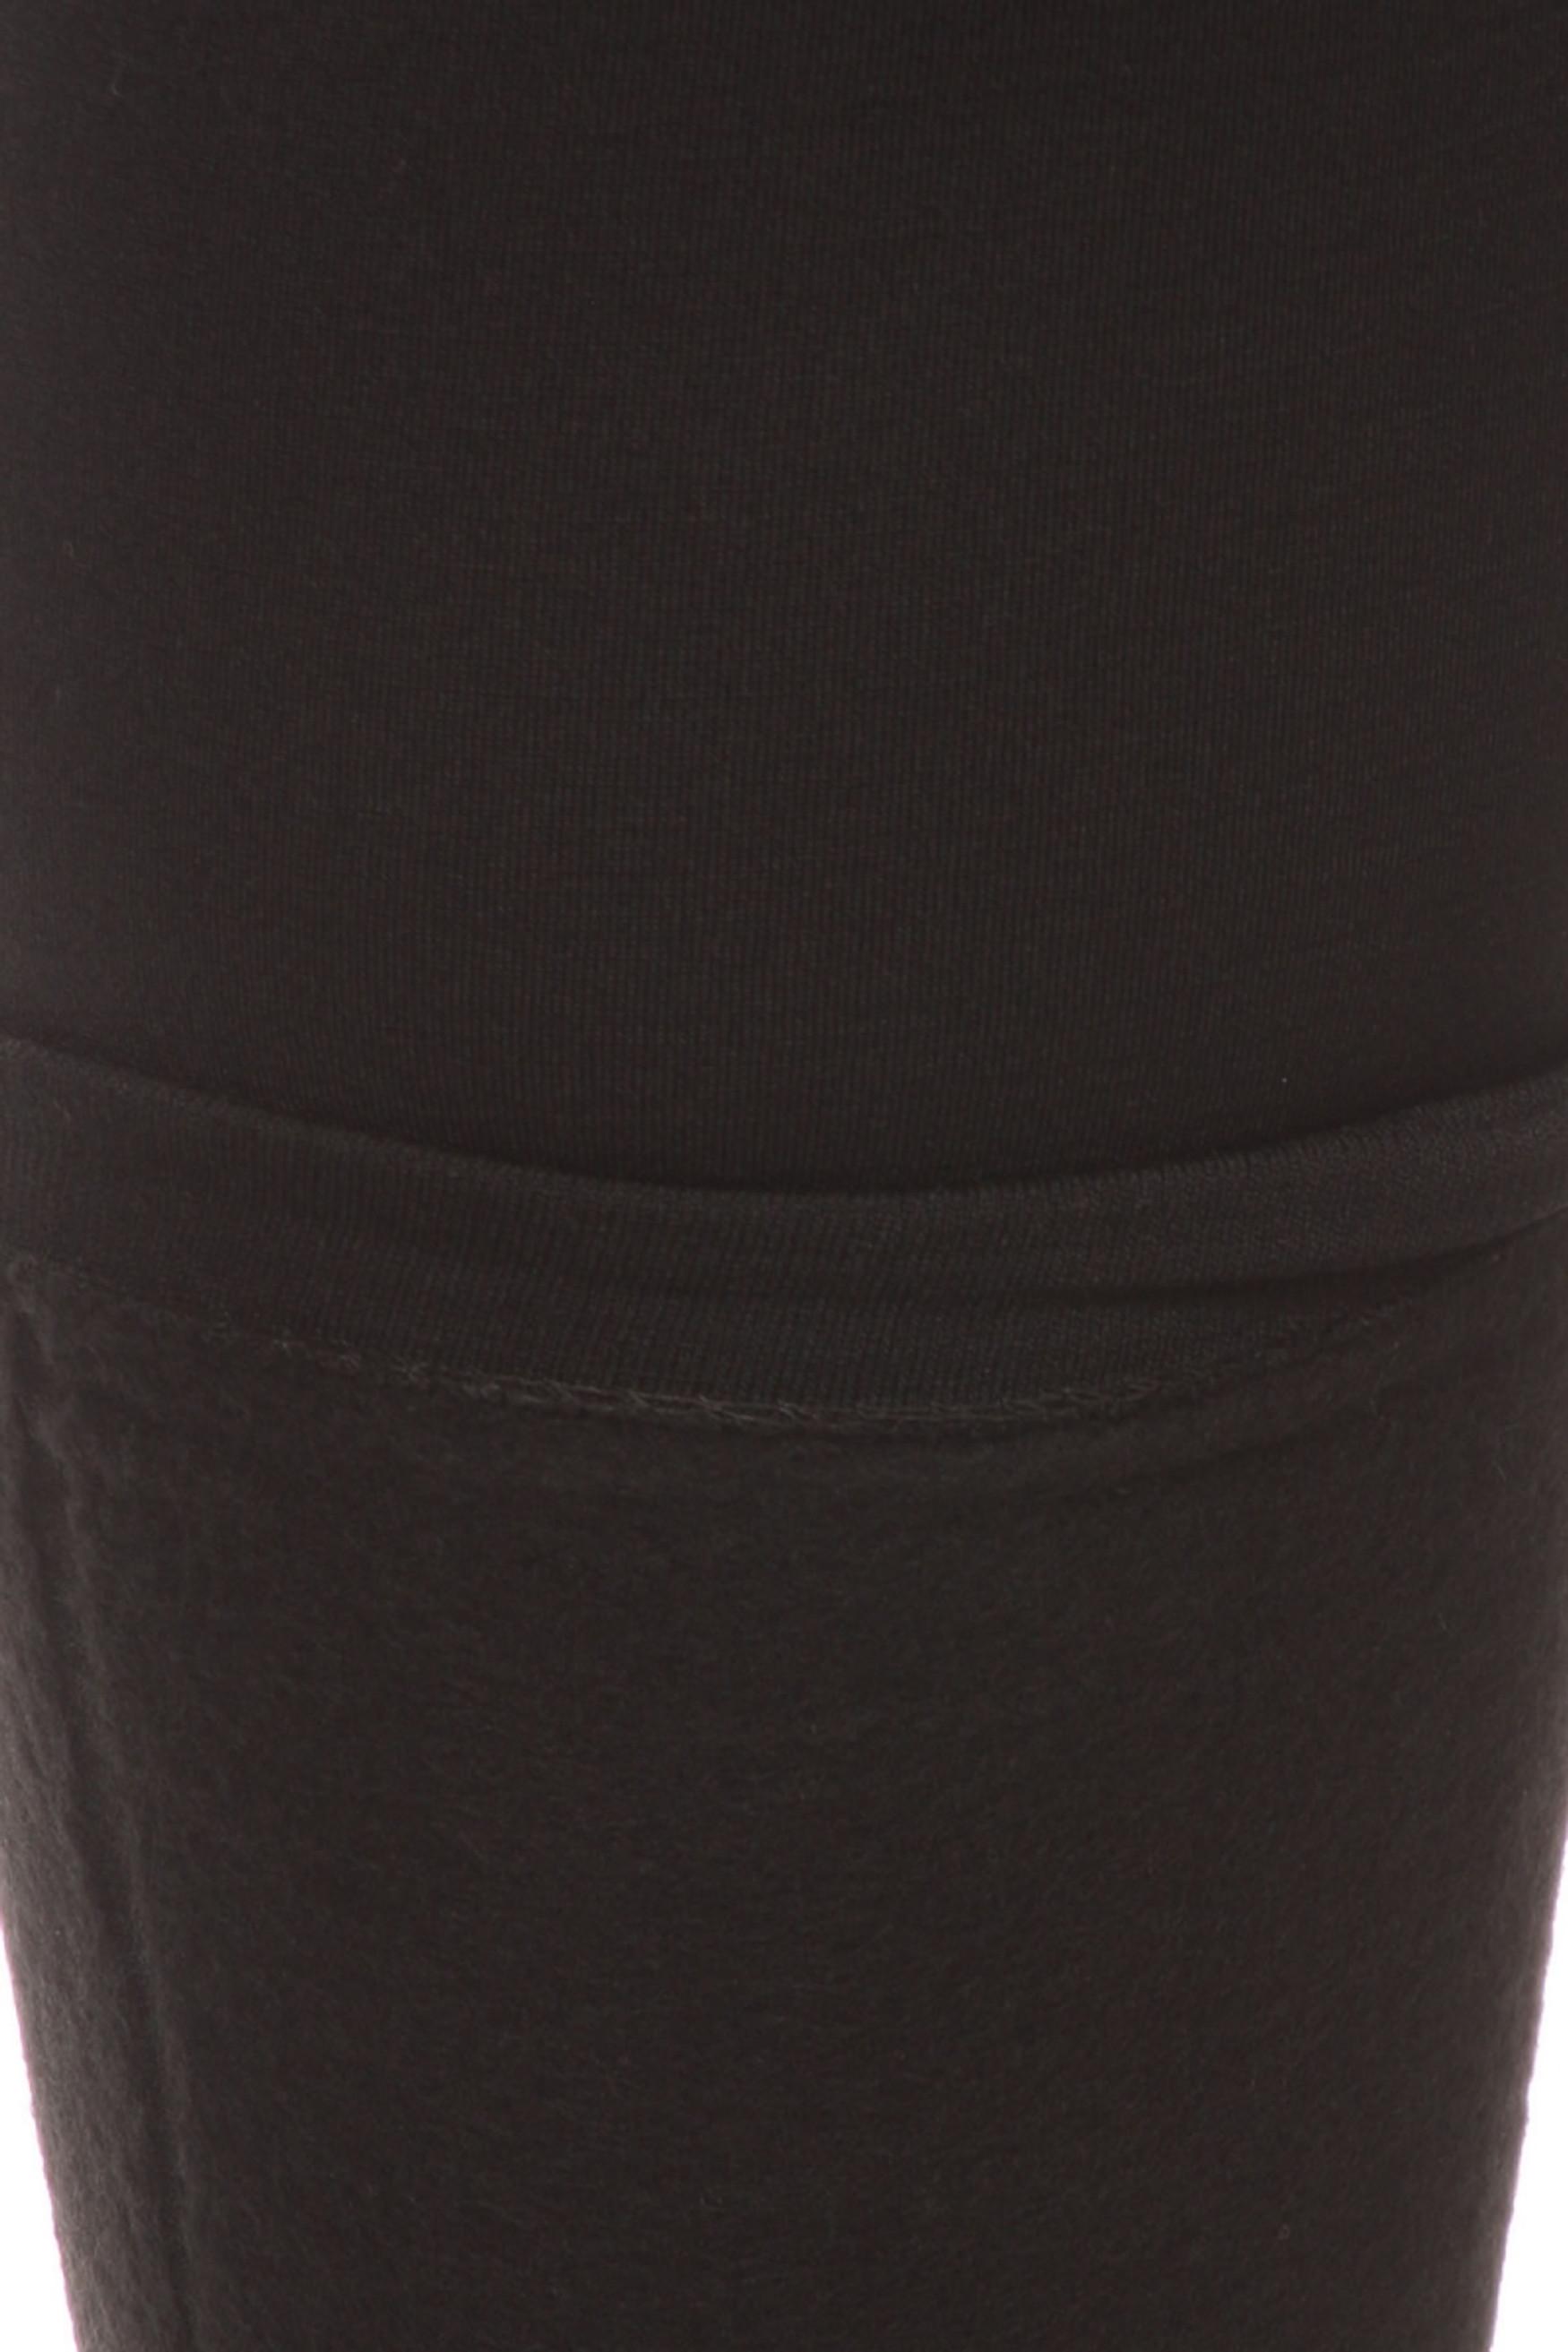 Close-up fabric image of  Premium Women's Fleece Lined Plus Size Leggings